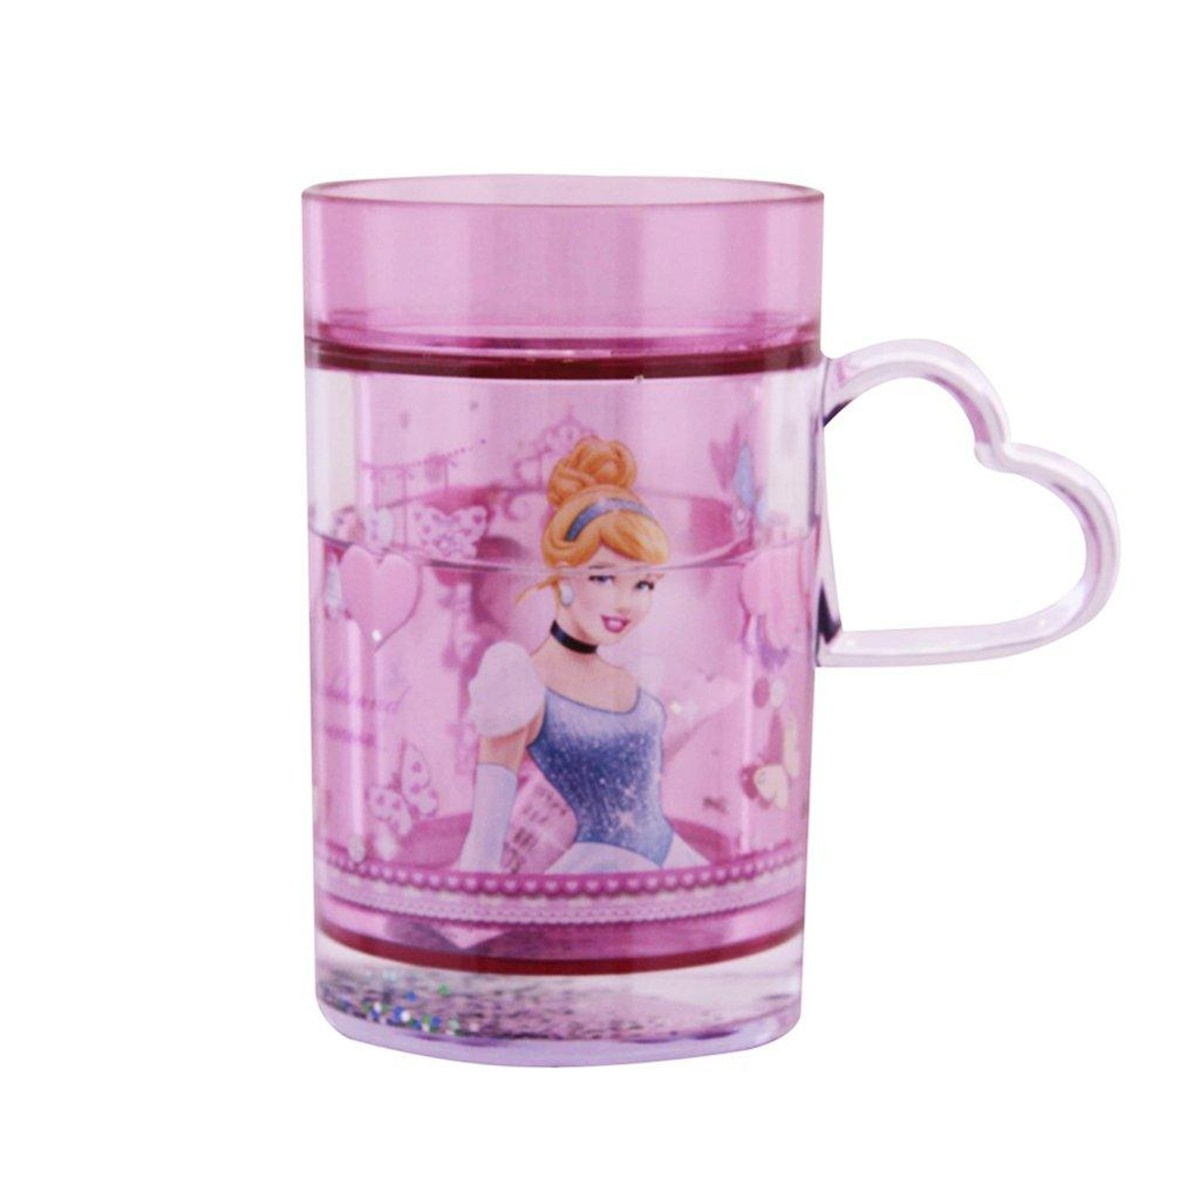 Ebebek Vardem Licensed Mug